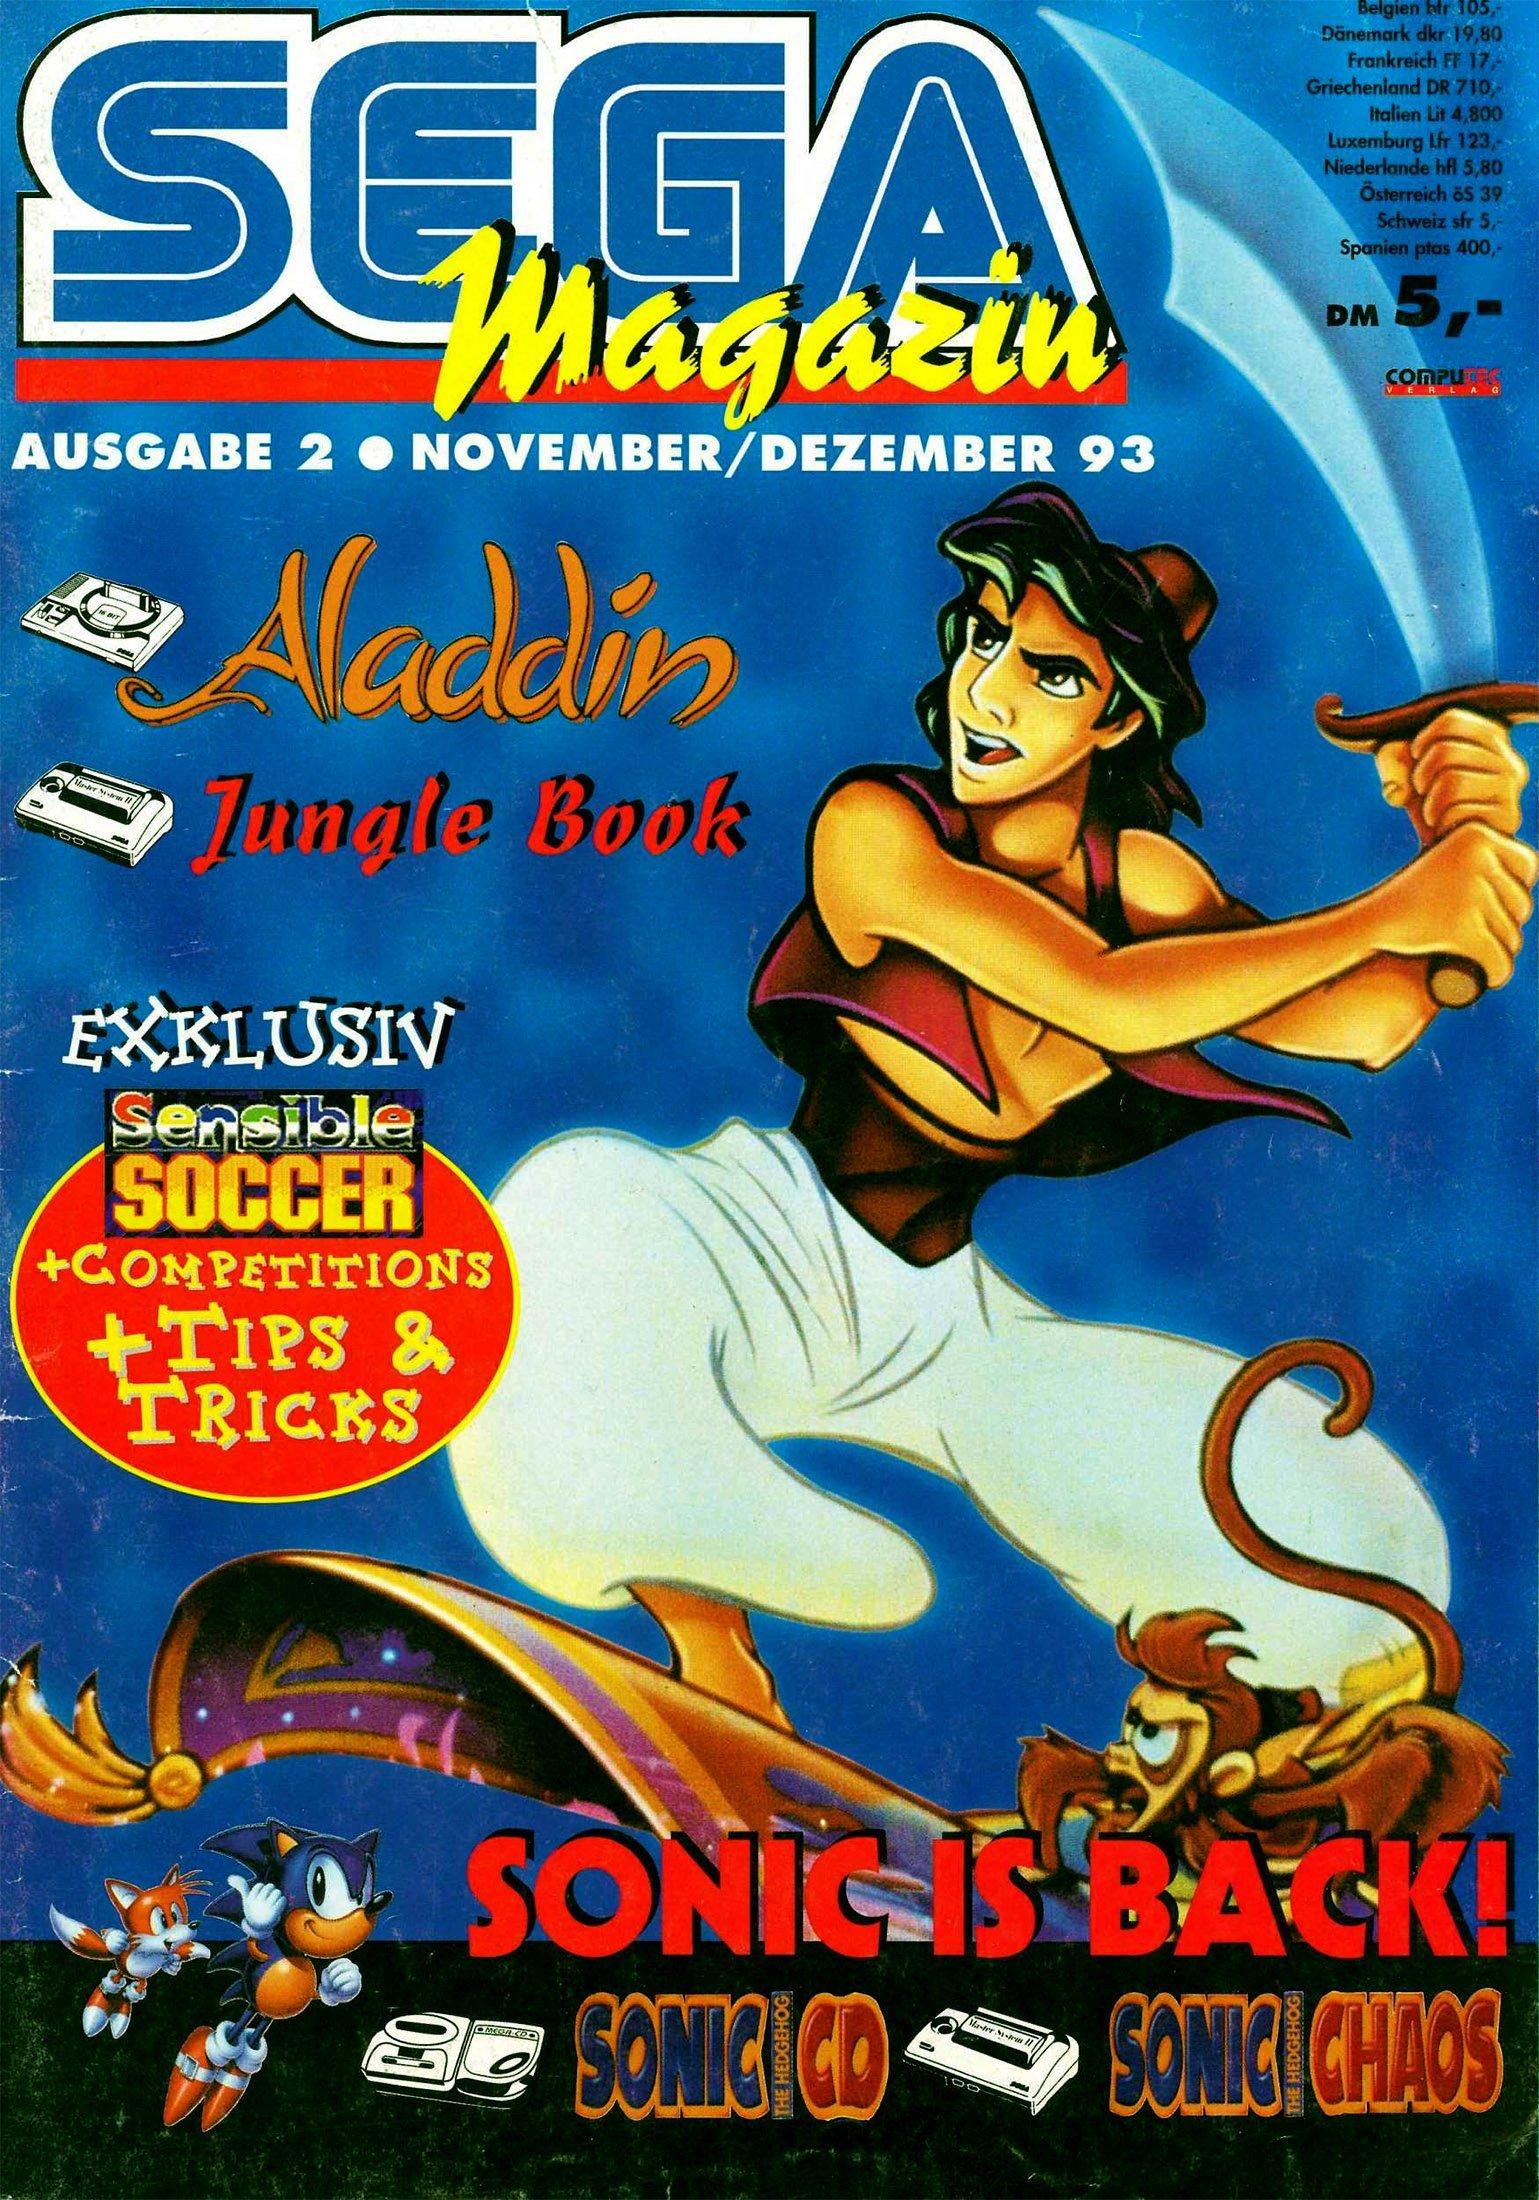 Sega Magazin Issue 02 (November / December 1993)